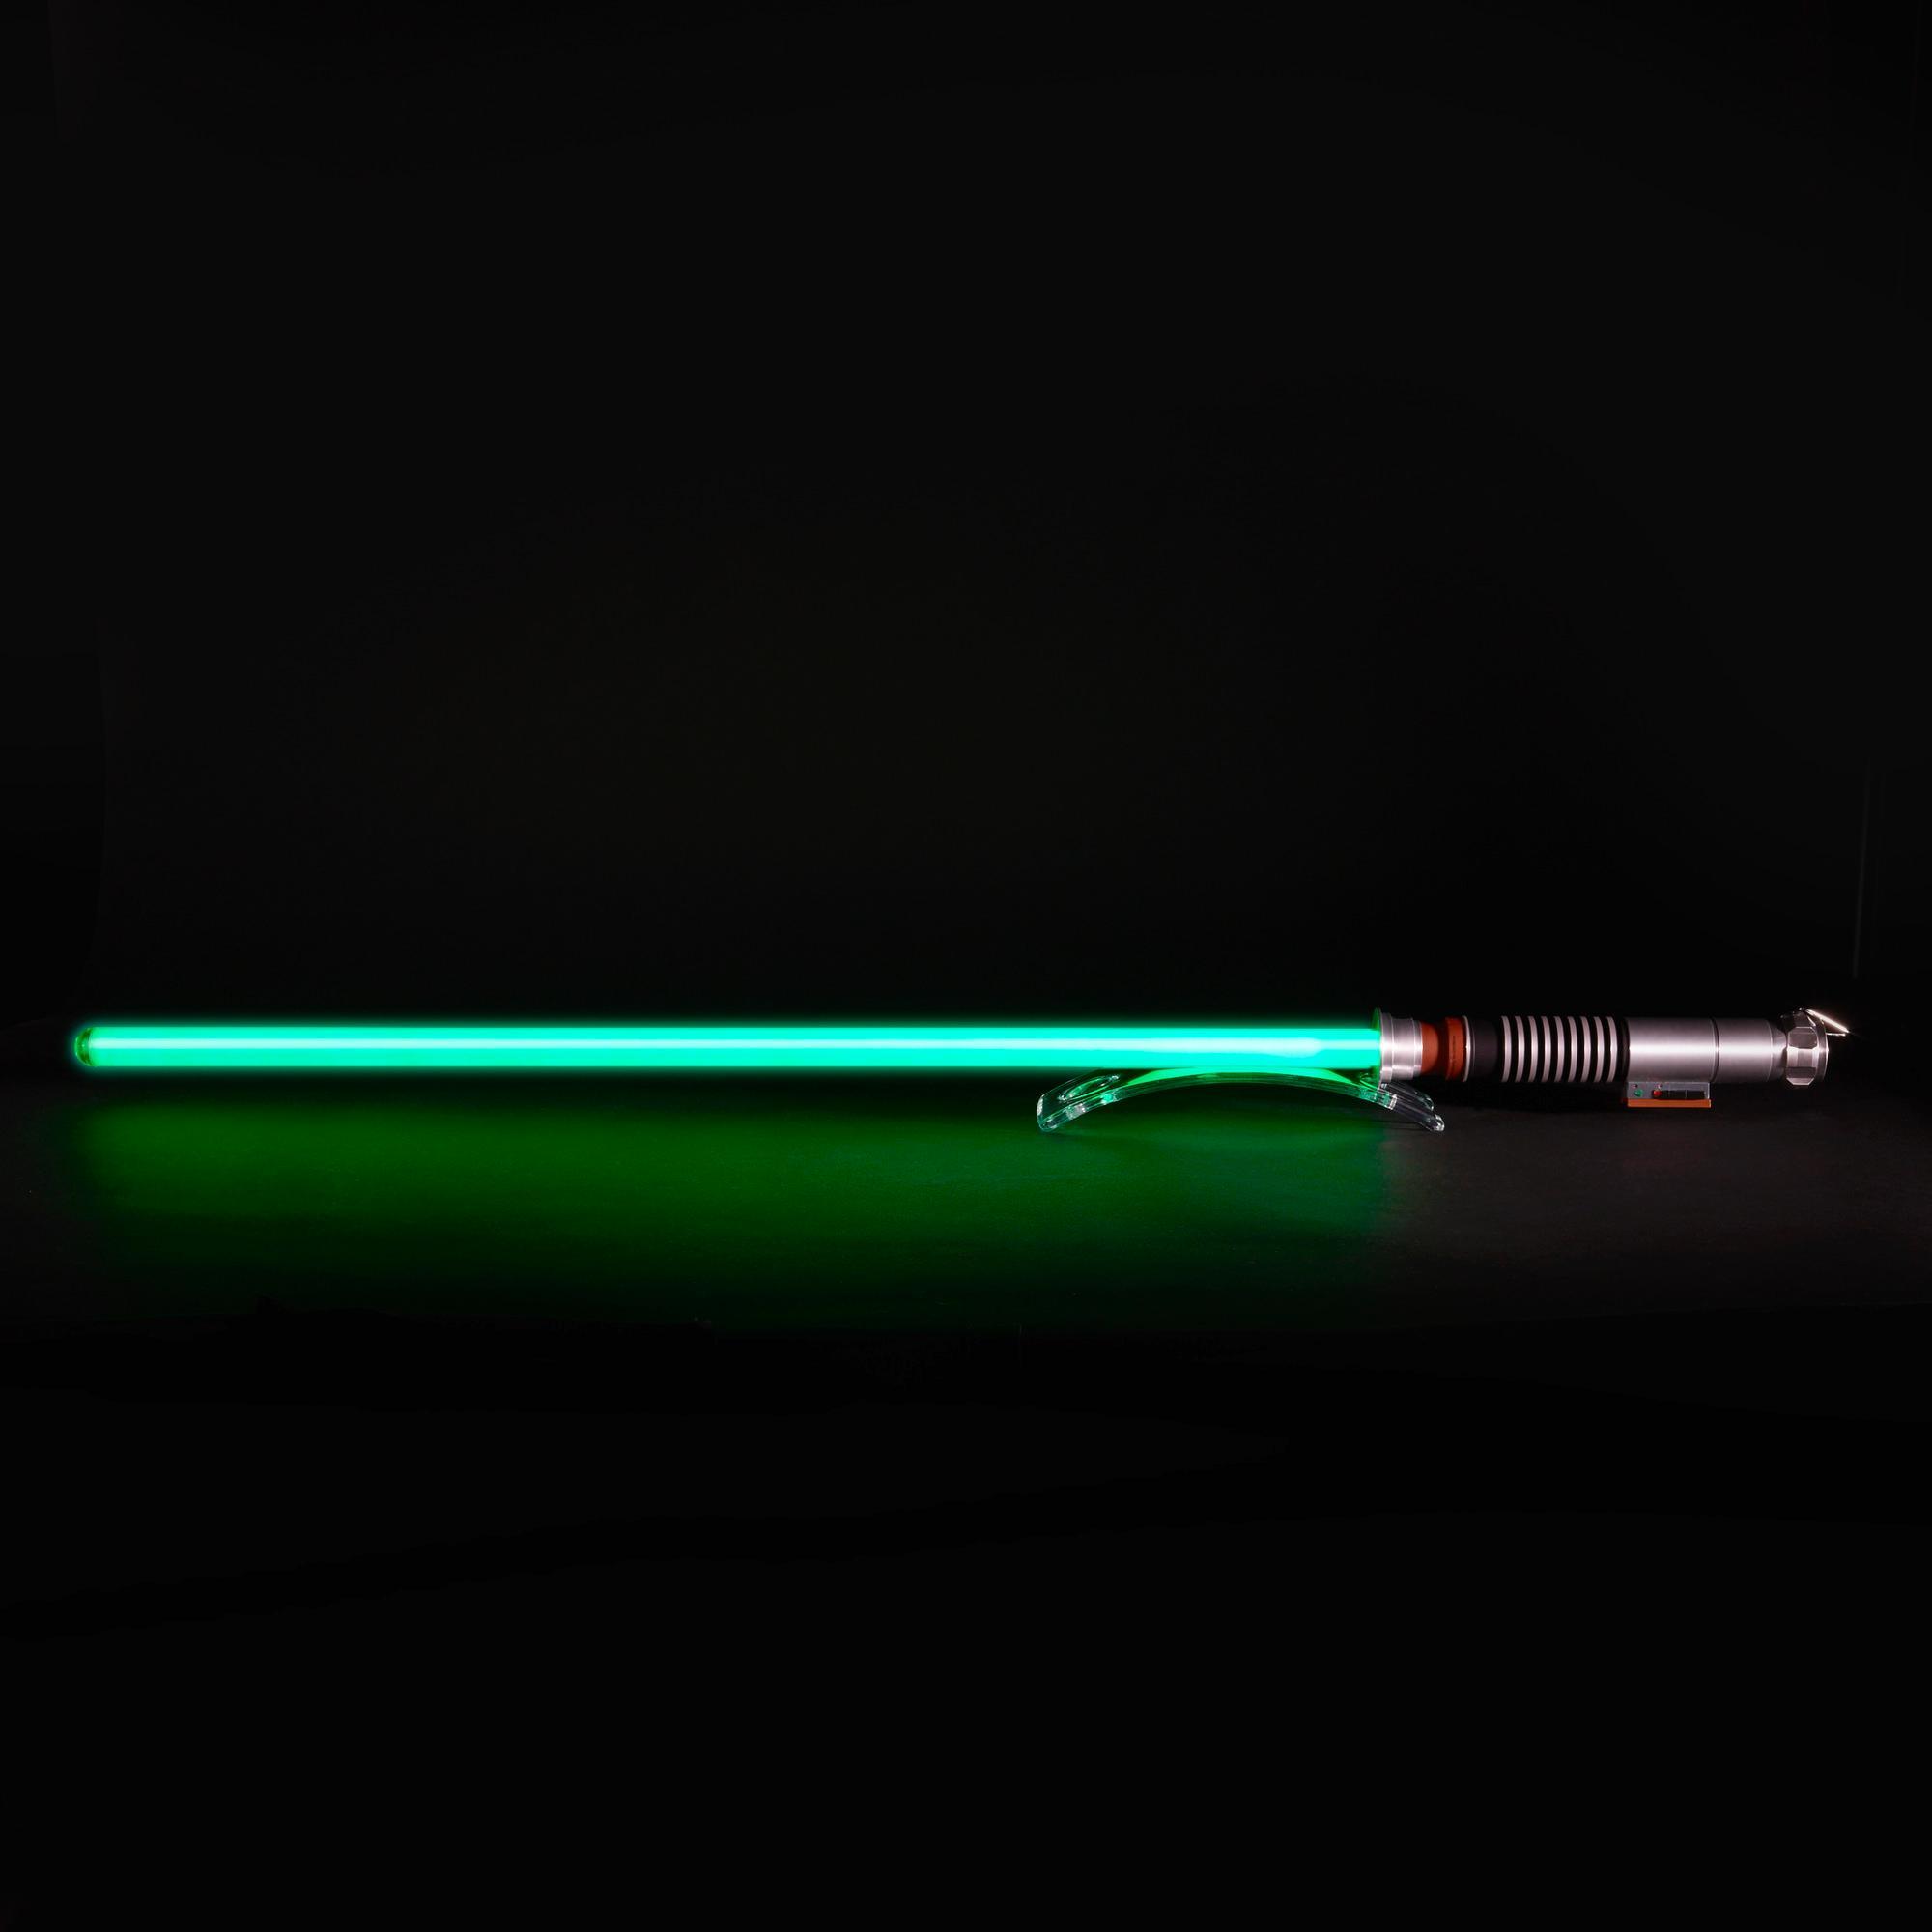 Star Wars La série noire - Sabre laser Force FX de Luke Skywalker